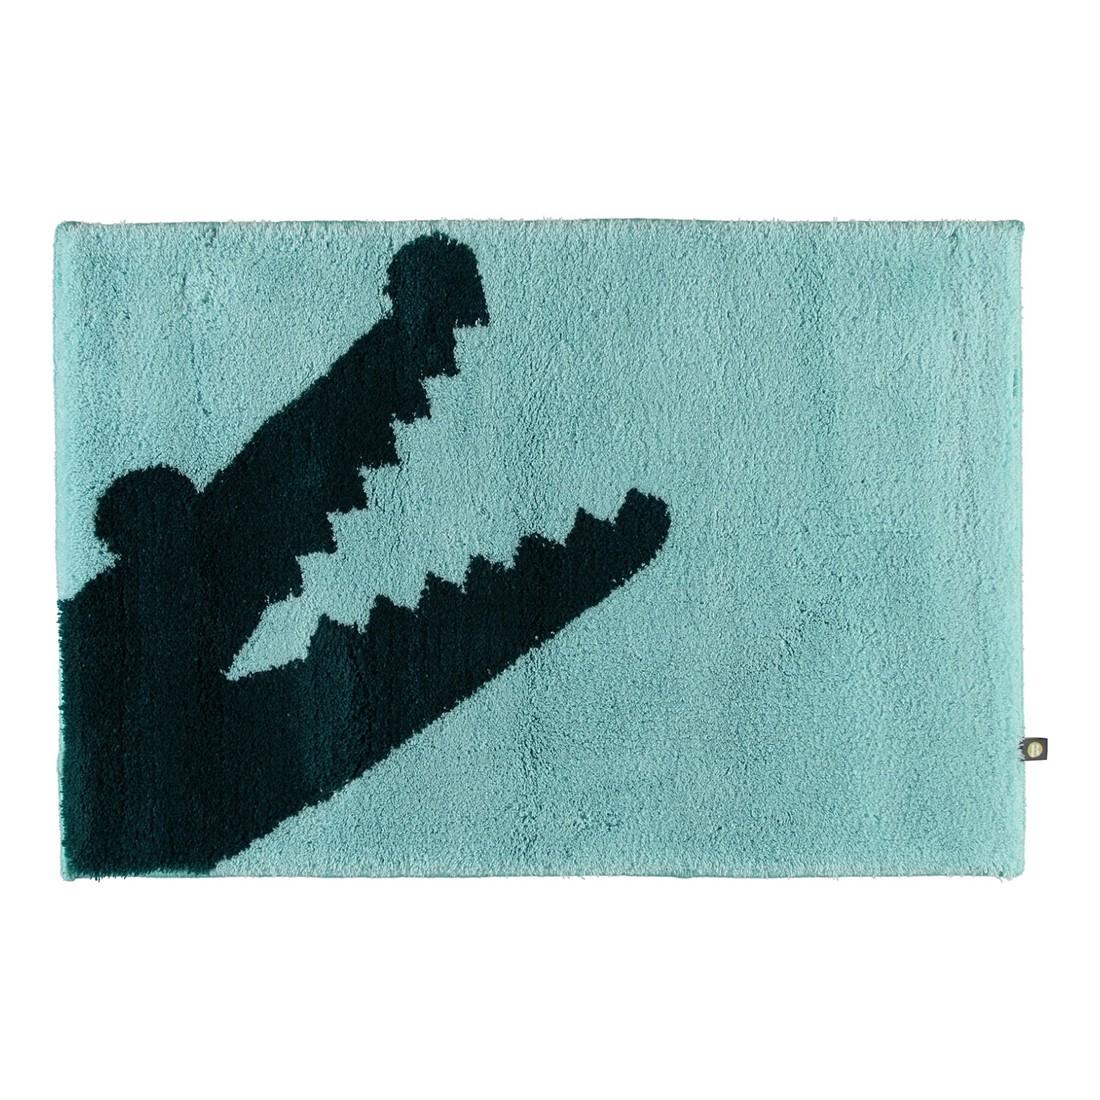 badteppich croc 100 polyacryl mint pazifik 1210 abmessungen 50 x 65 cm rhomtuft g nstig. Black Bedroom Furniture Sets. Home Design Ideas